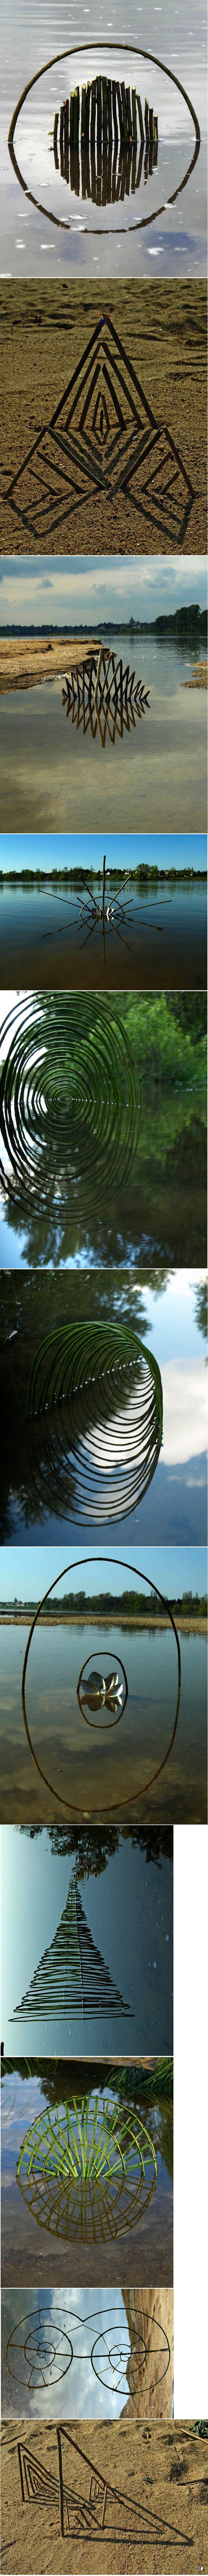 Art Reflection. .. God dammit!